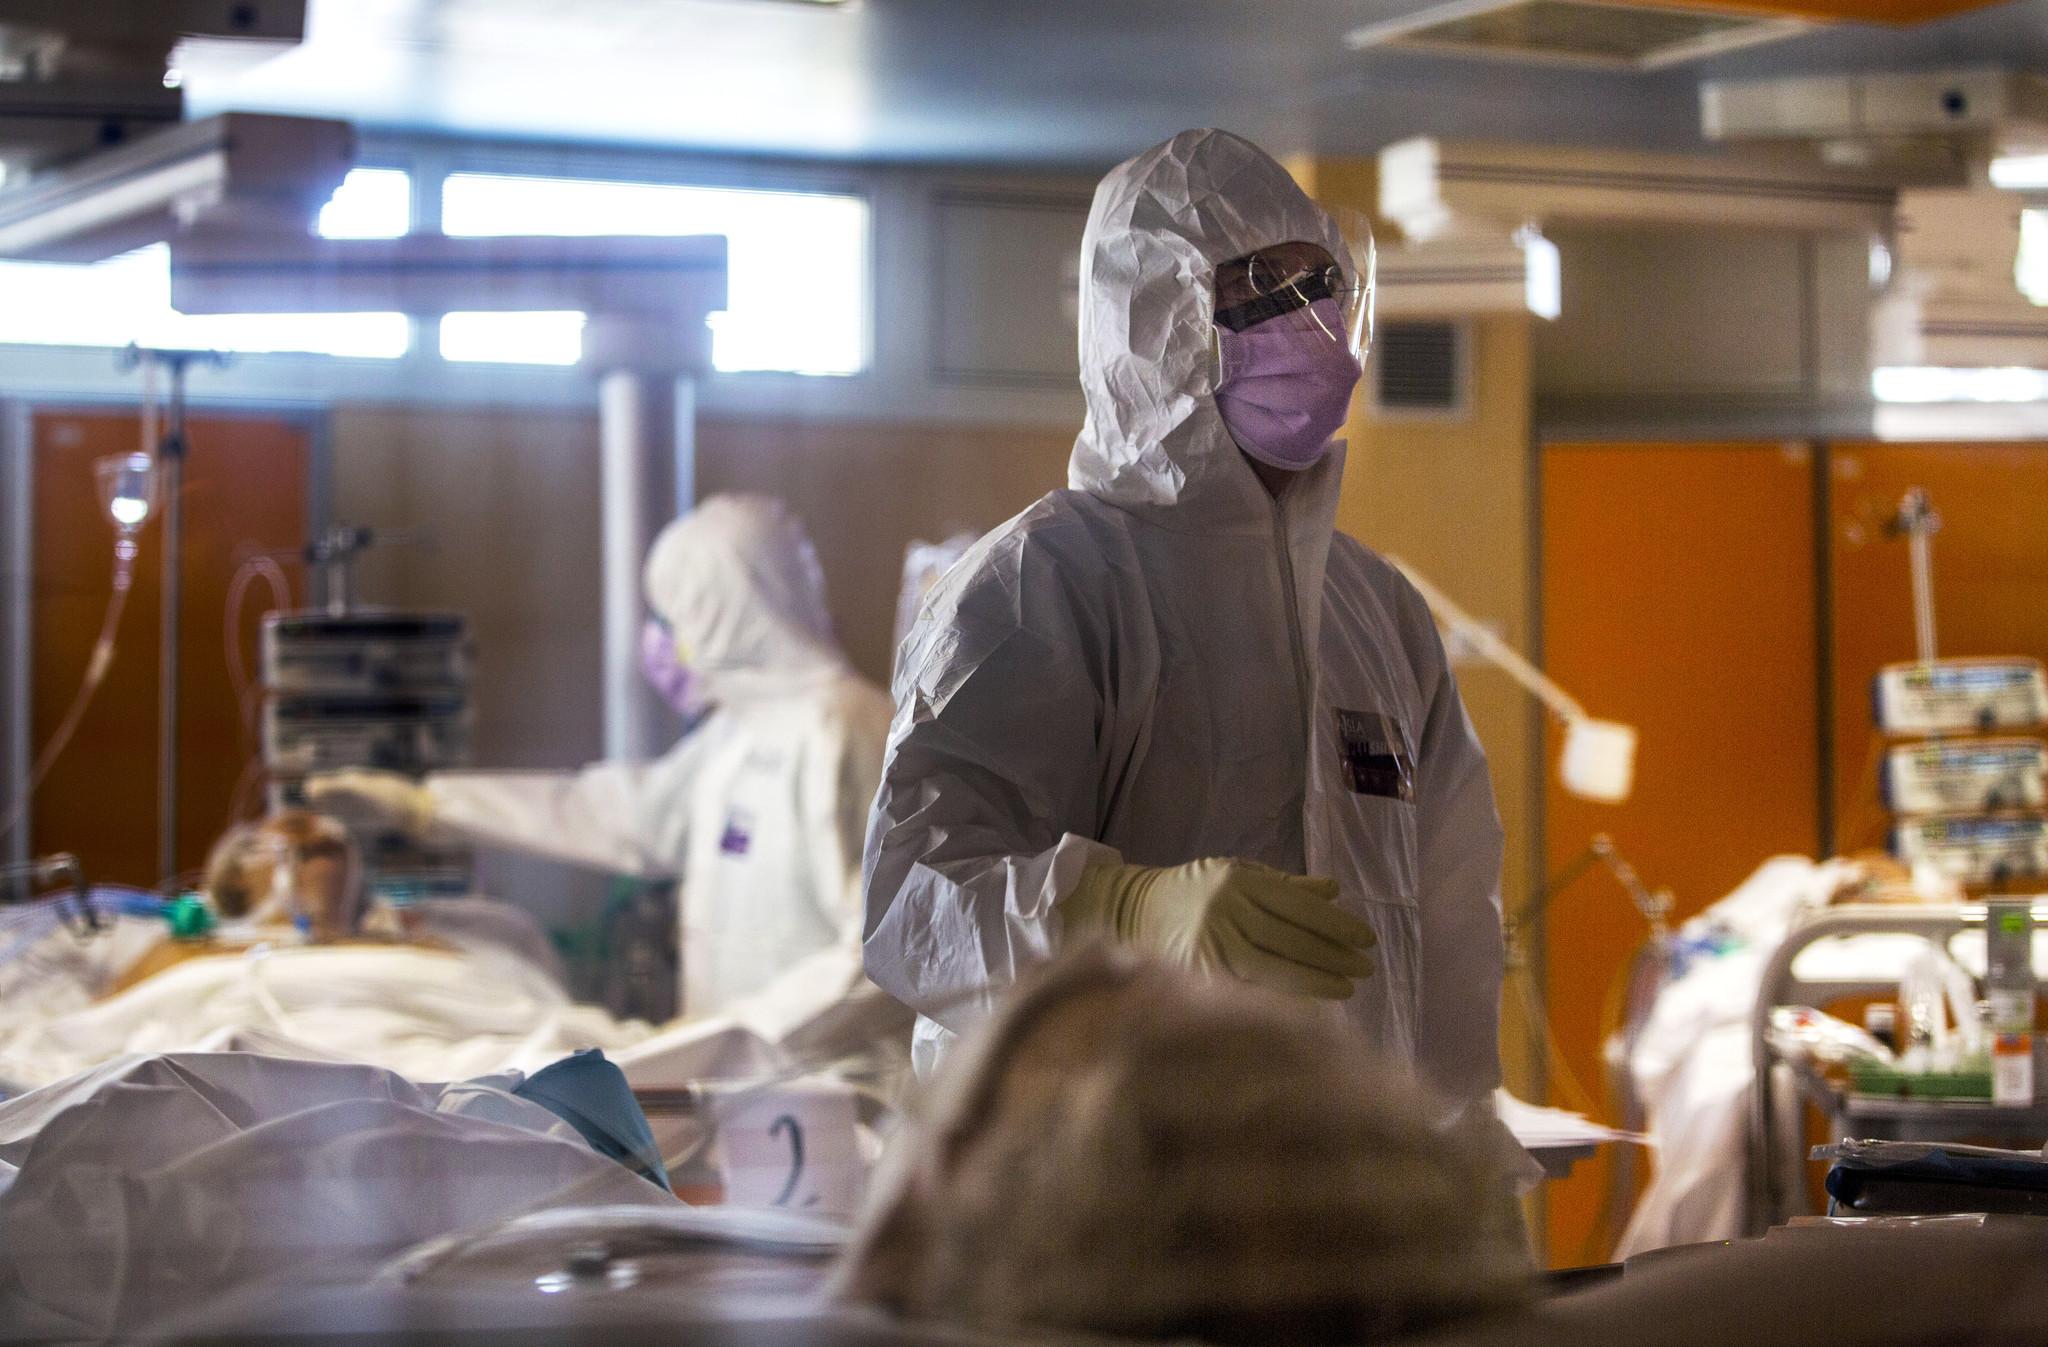 6 nuns at Italian convent dead, 9 hospitalized with coronavirus